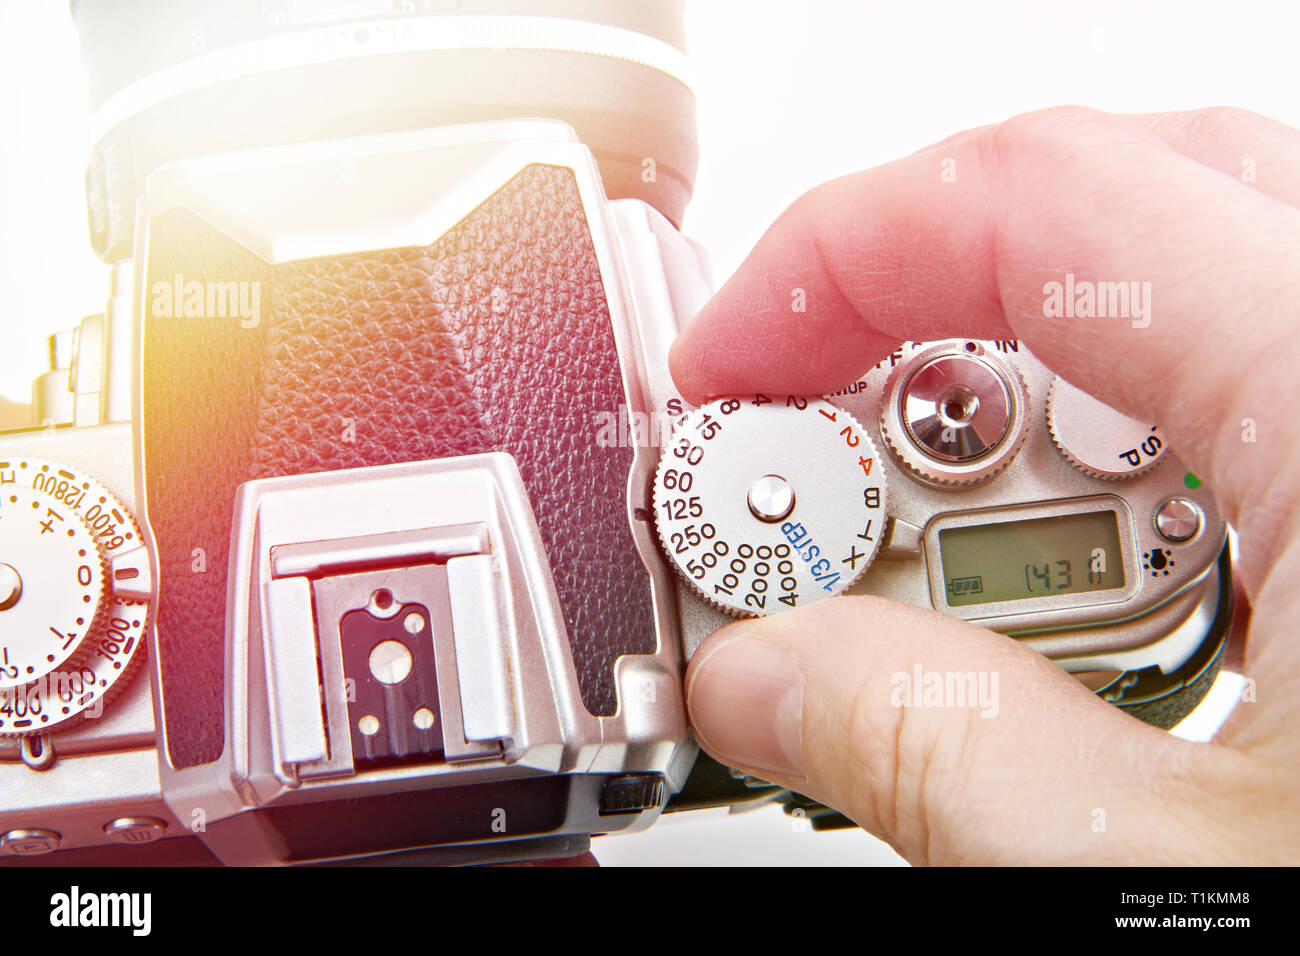 Photographer setting shutter control dial on retro SLR camera closeup - Stock Image